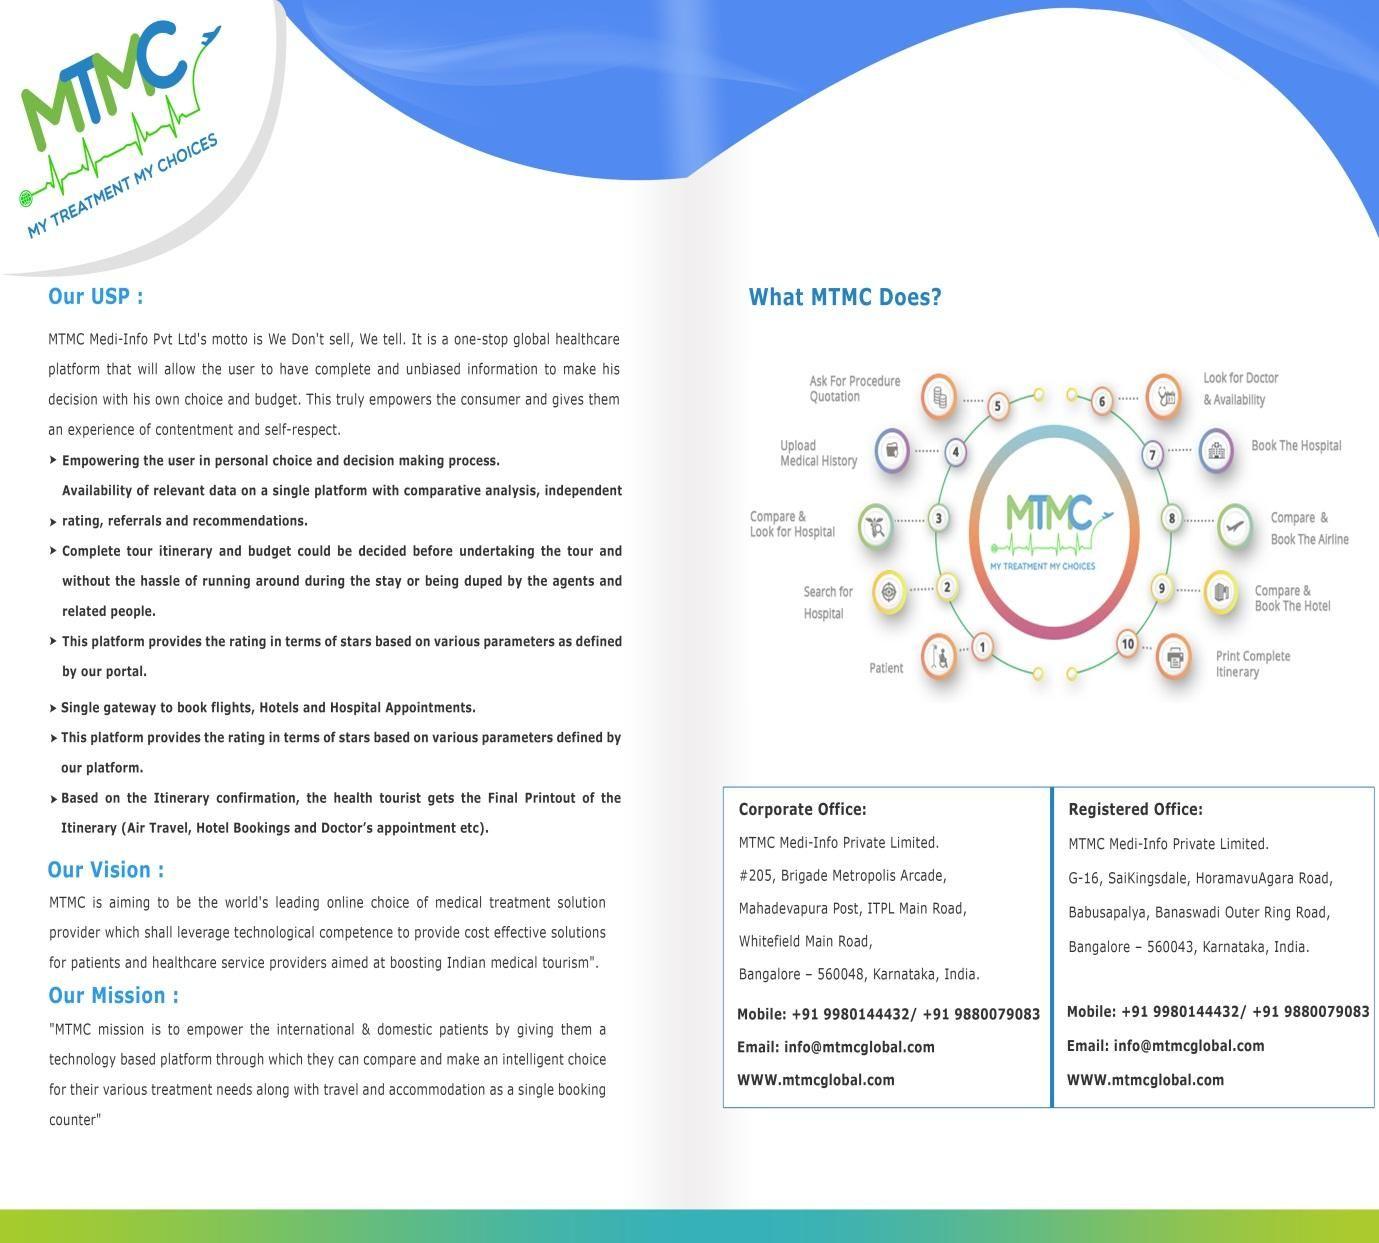 Mtmc Usp Vision And Mission Medical Tourism Tourism Medical